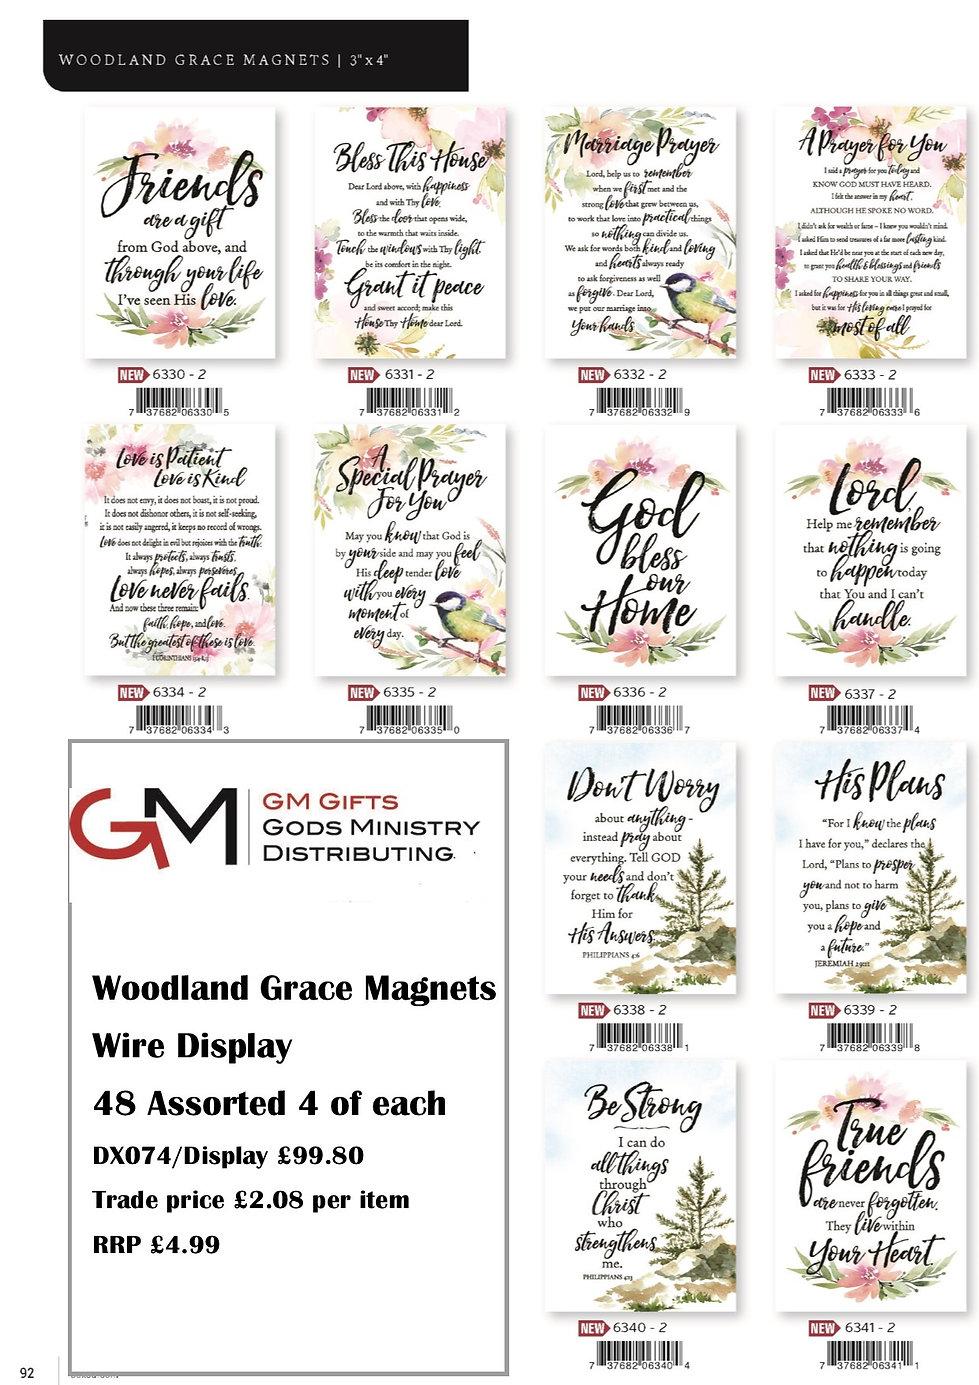 Woodland Grace Magnets Sales Sheet .jpg